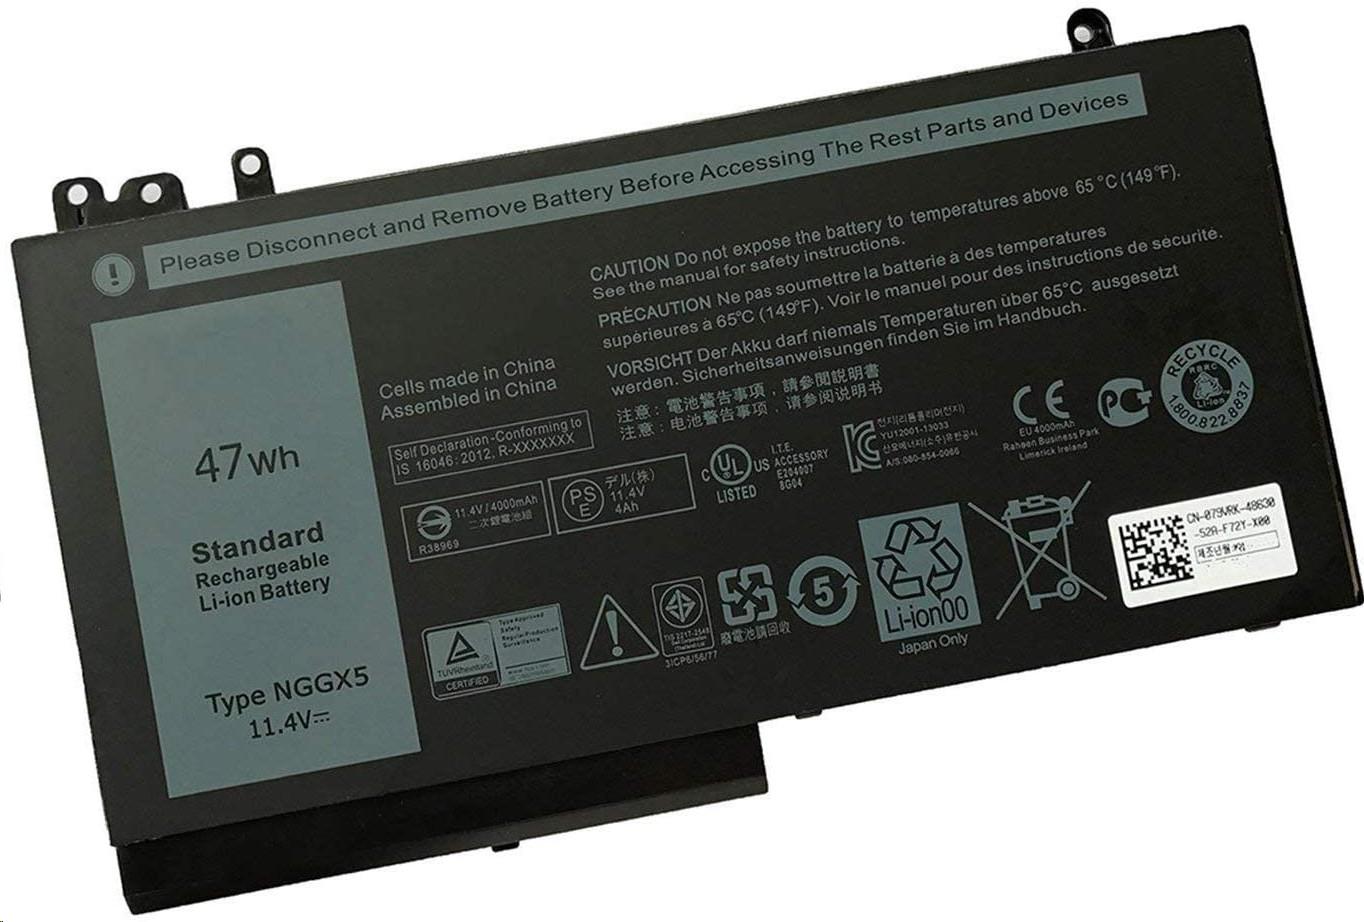 BTI Battery Li-Ion 3-Cell Primary 11.4V 47Whr For Dell Latitude E5270 NGGX5-BTI